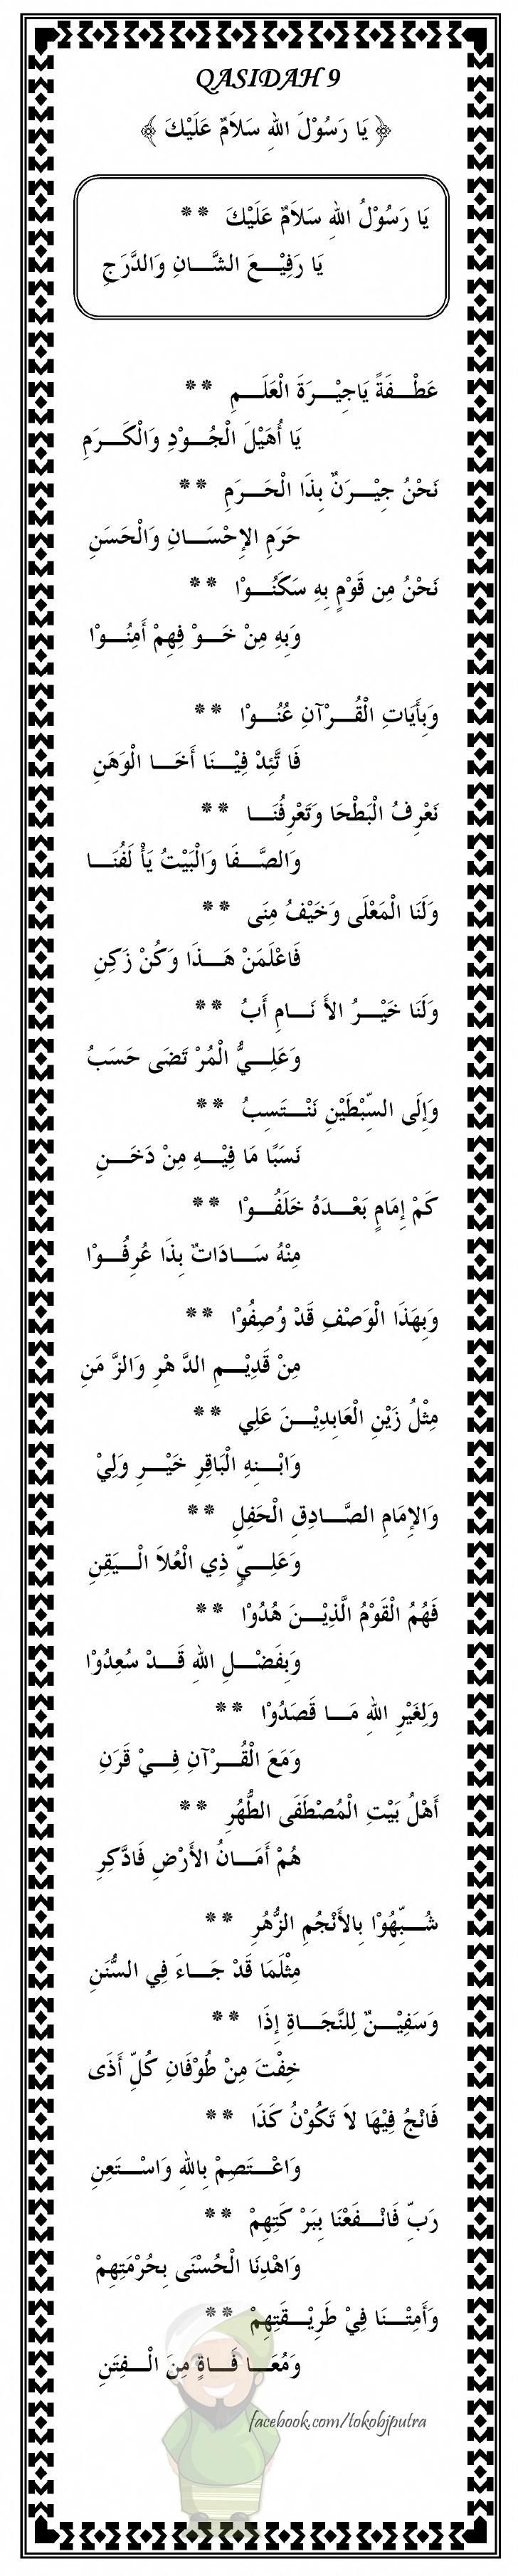 Tawasul Nurul Musthofa : tawasul, nurul, musthofa, Kumpulan, Qasidah, Sholawat, Nasyid, Facebook.com/tokobjputra, Download,, Borrow,, Streaming, Internet, Archive